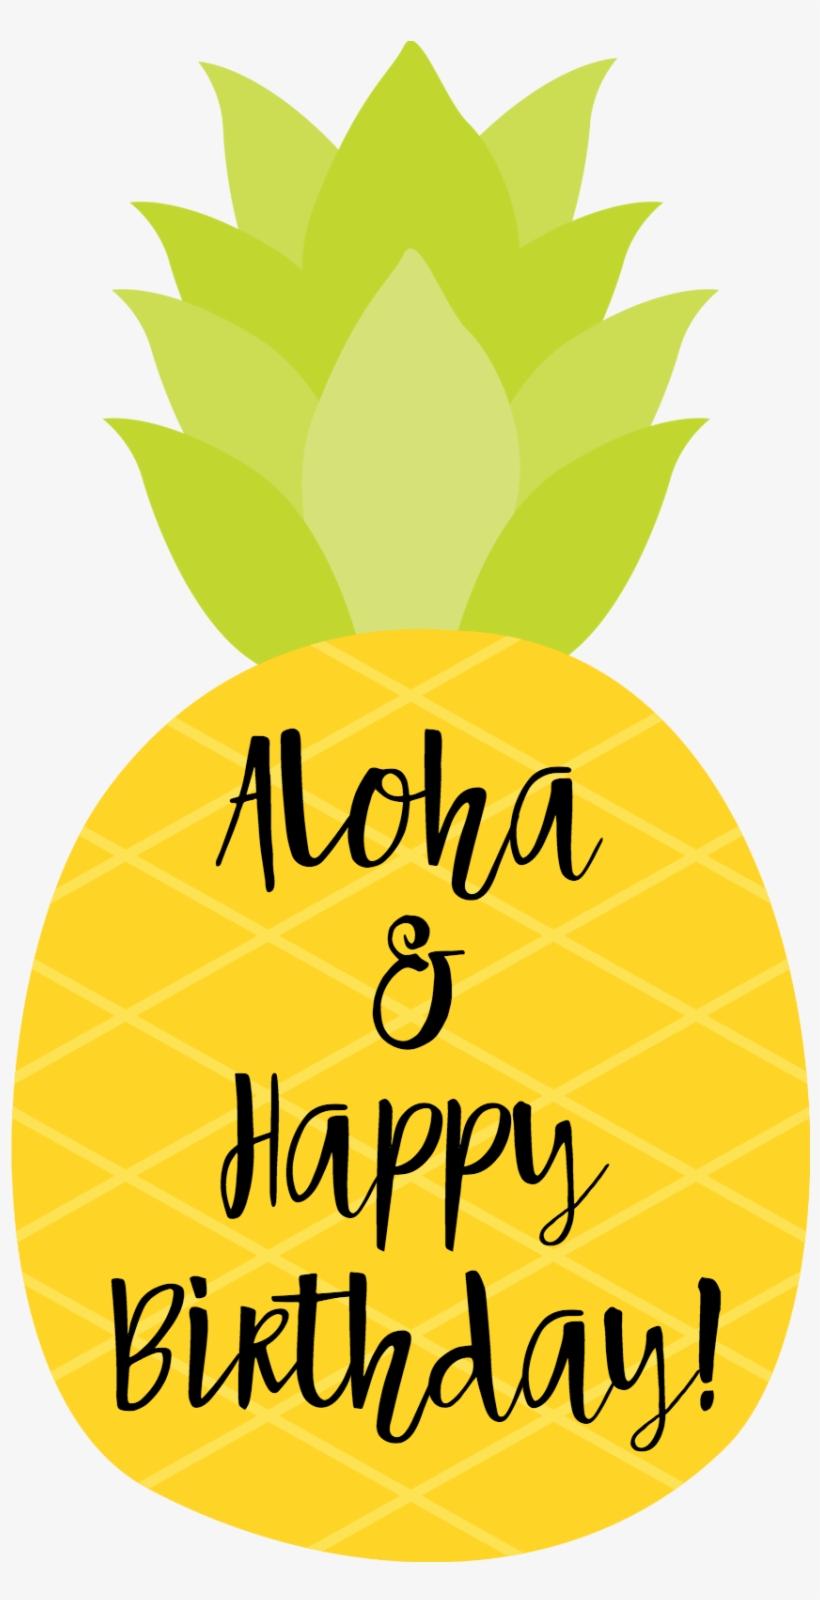 Happy Birthday Tag Pineapple - Happy Birthday Pineapple Theme, transparent png #4077420